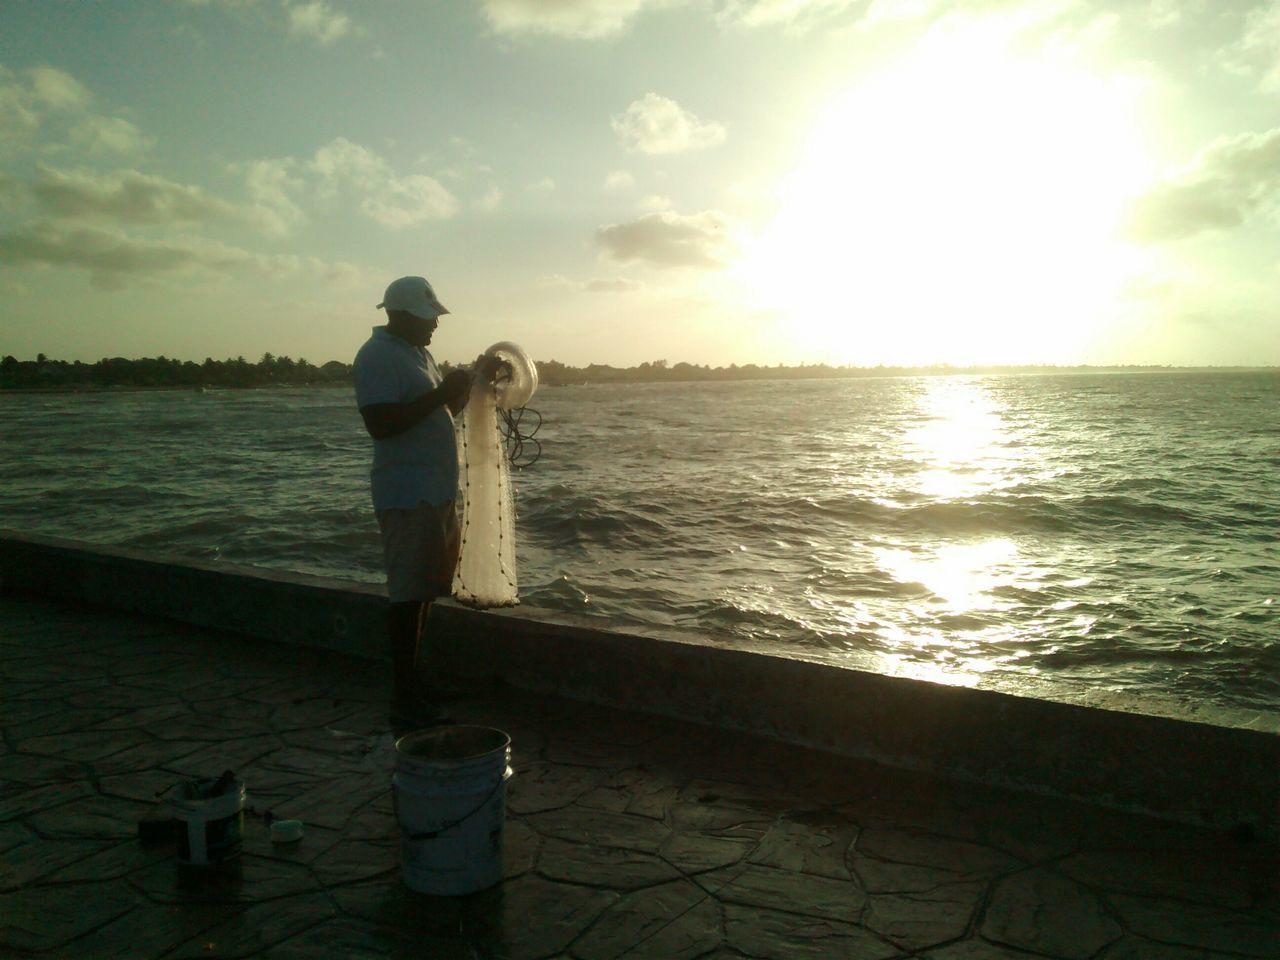 Fisherman Fishing Net Fishing Time Sunset Silhouettes People And Places People And Nature Sealife♡ Yucatán, México PuertoProgresoYucatan First Eyeem Photo